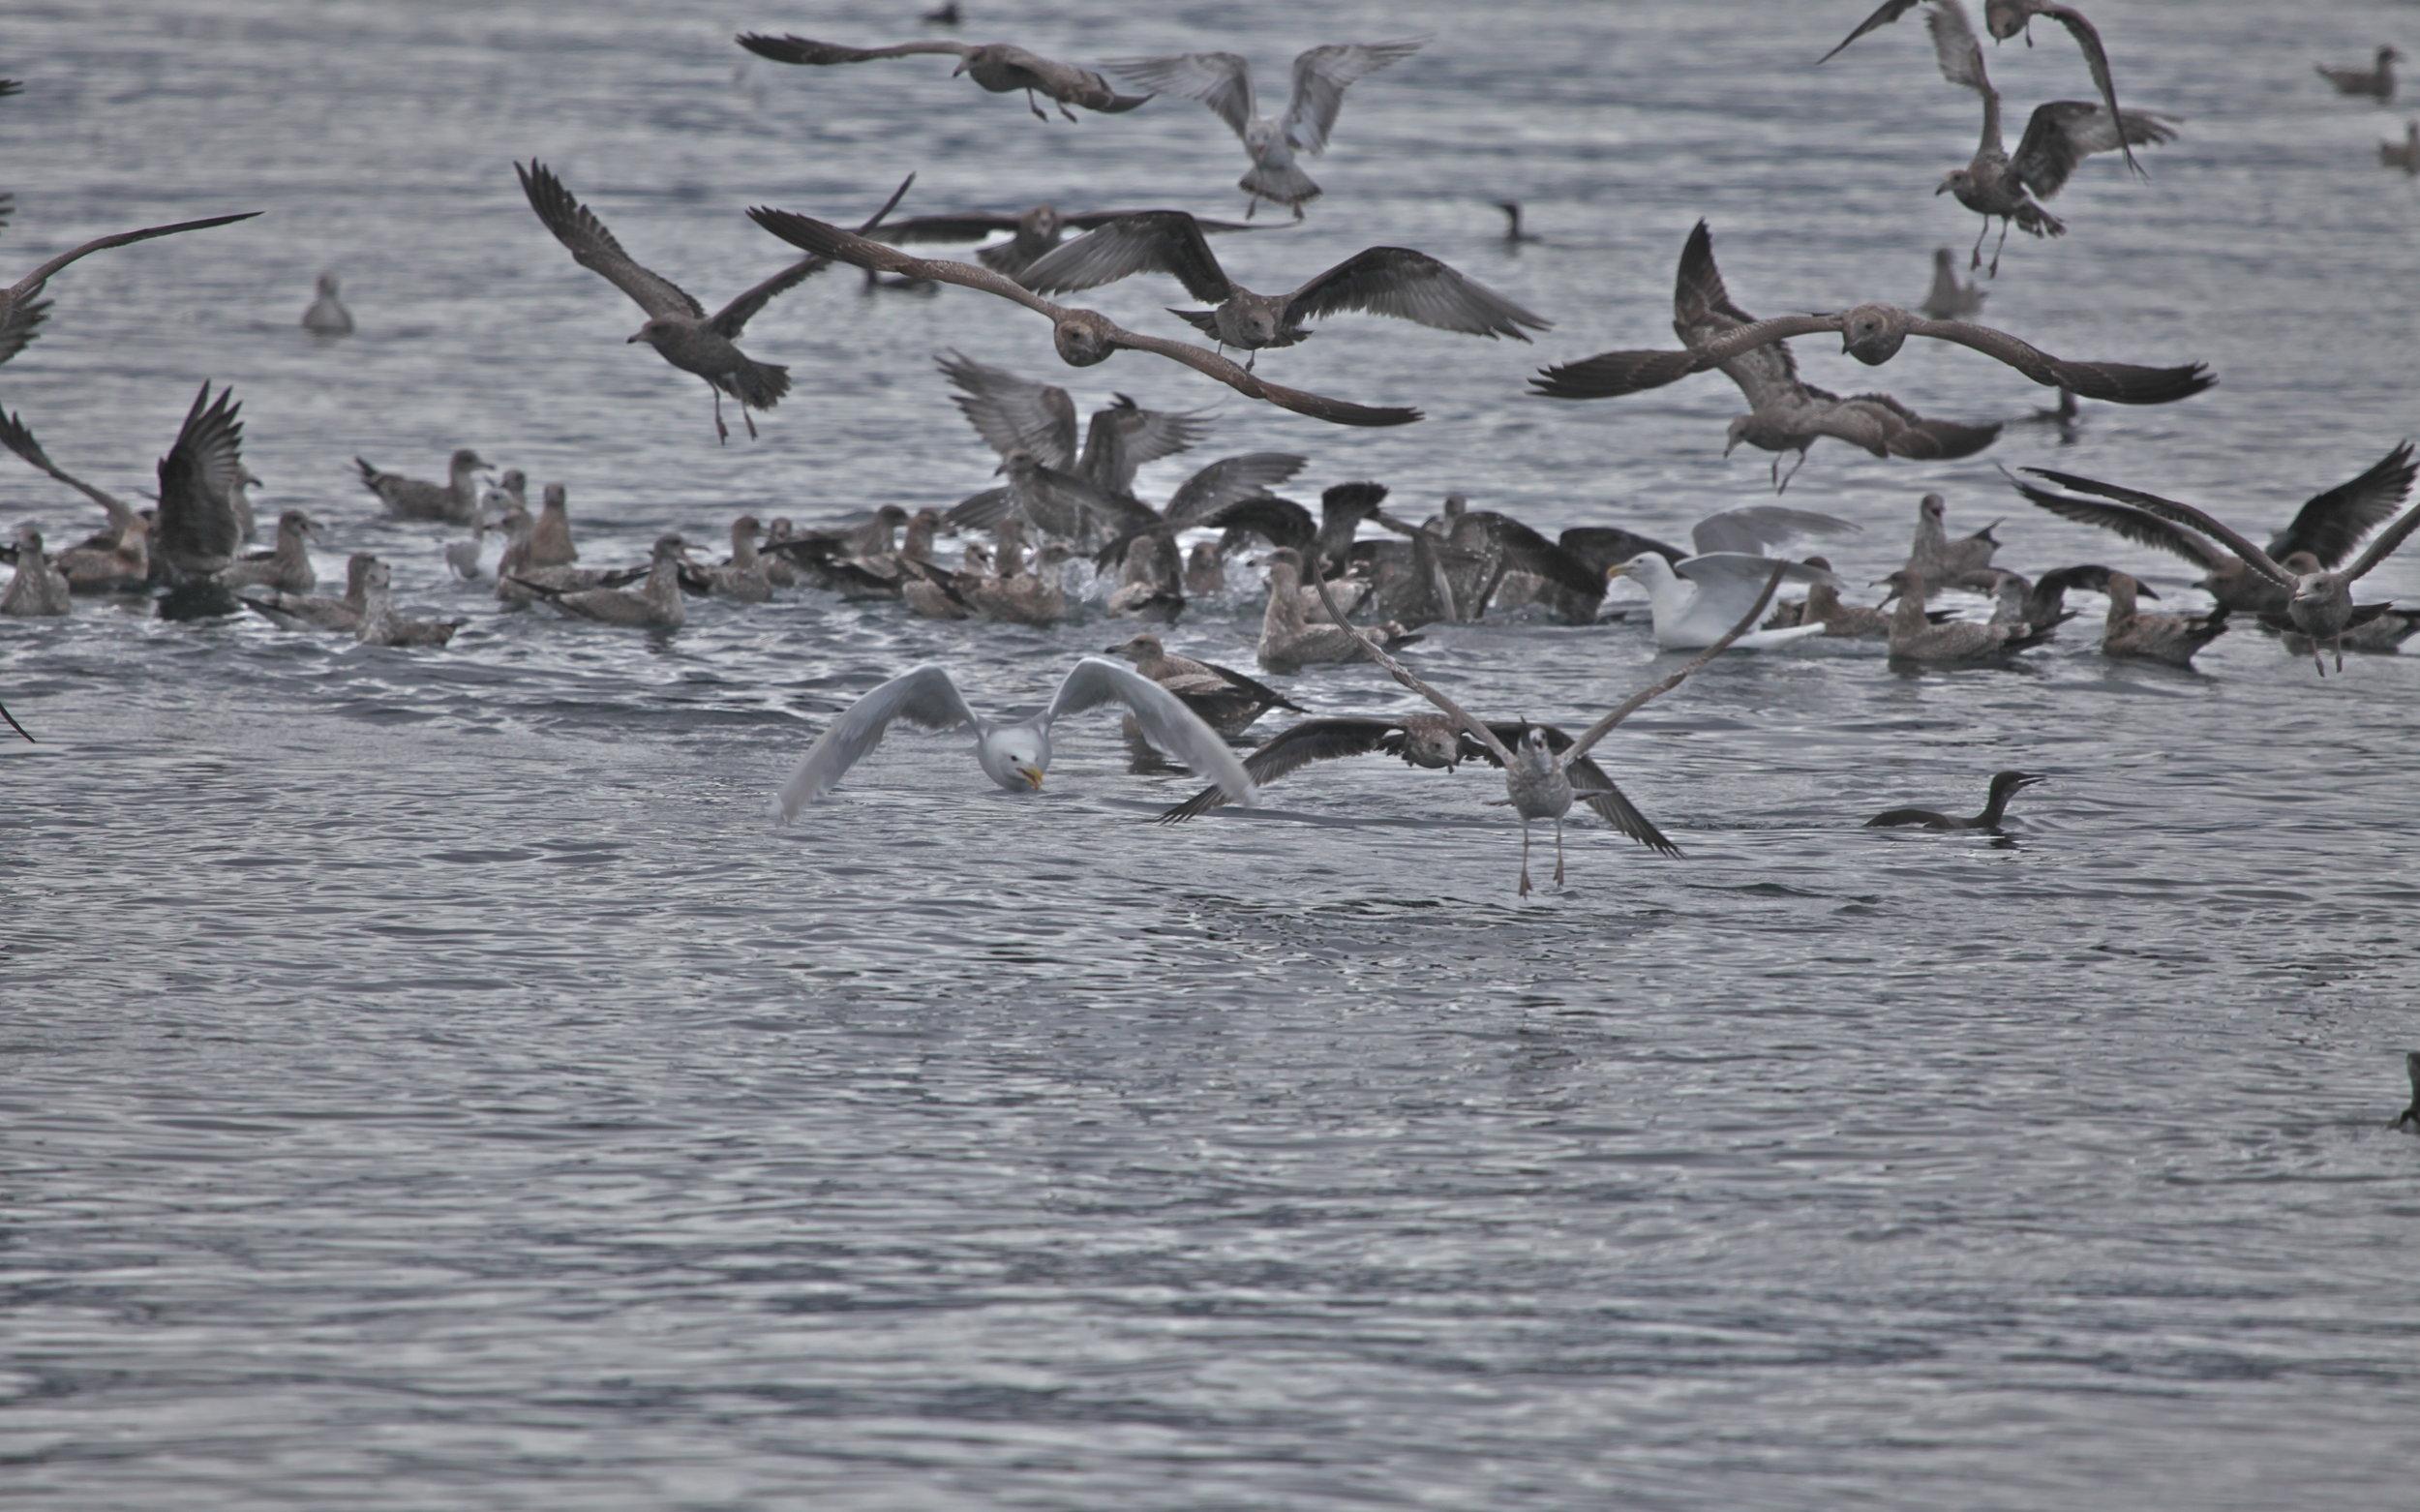 Gulls feeding on a herring/bait ball